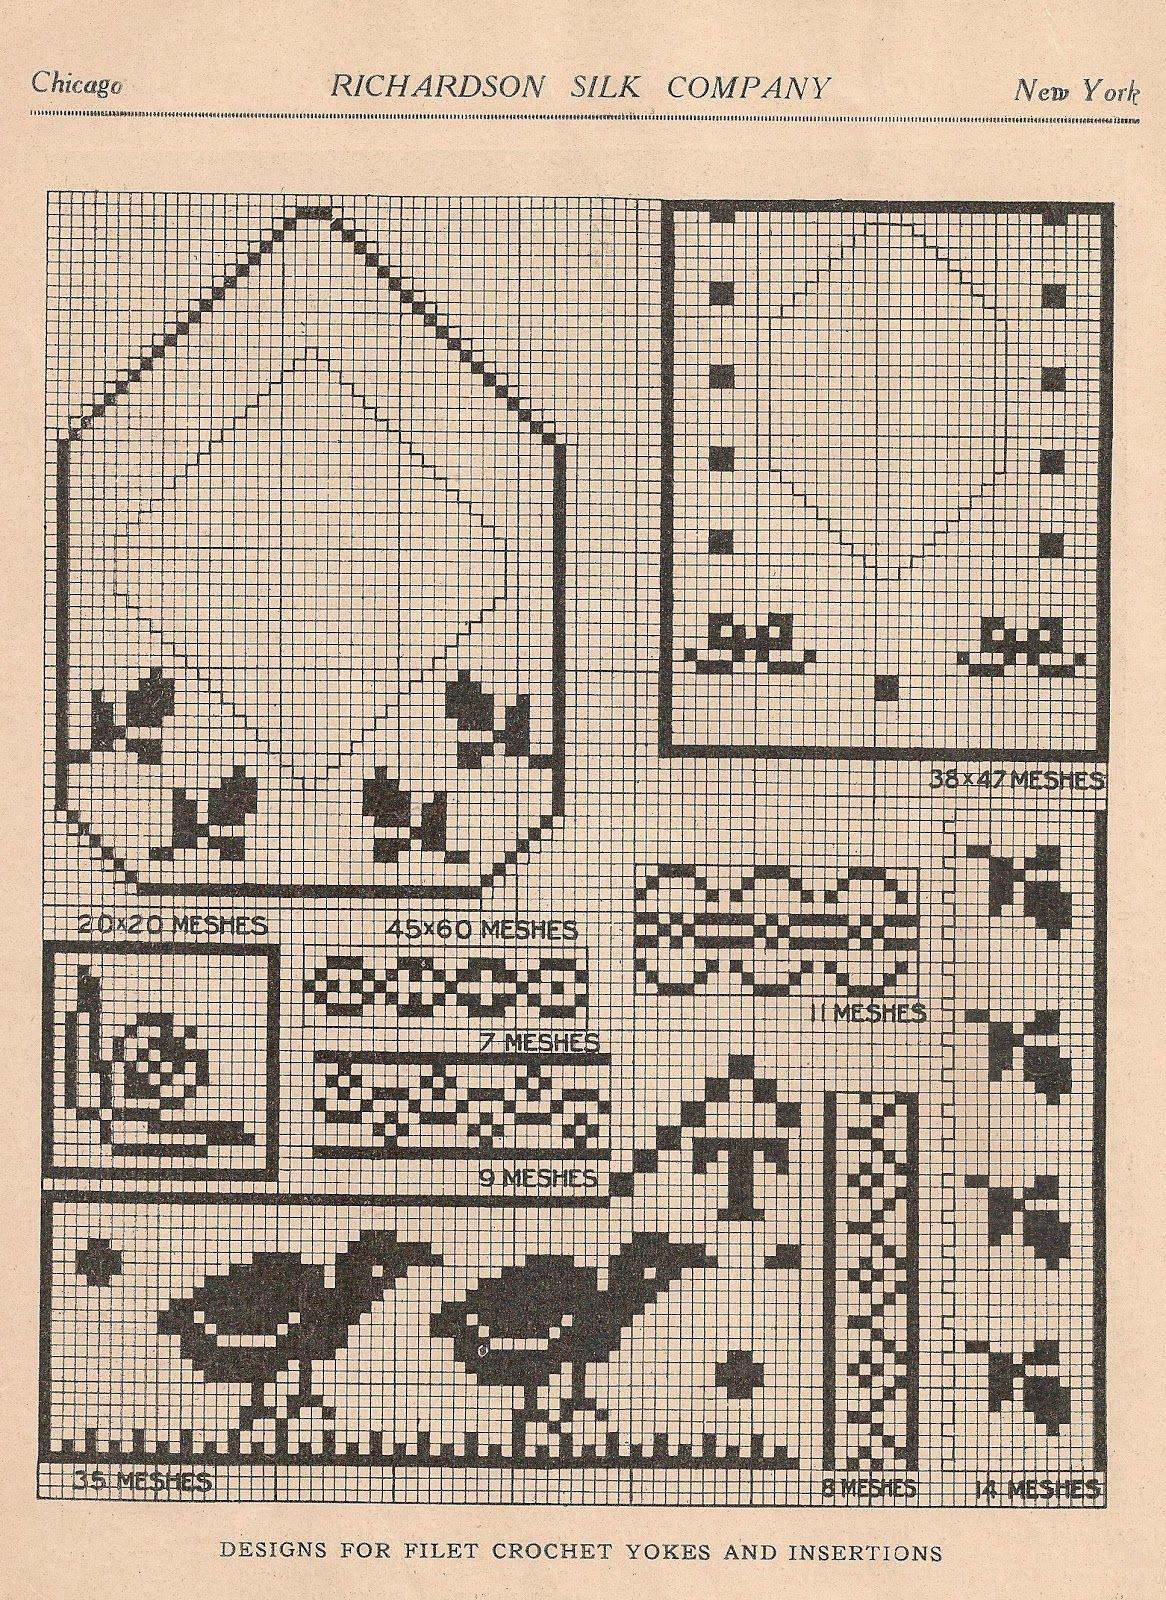 Sentimental baby free cross stitch or filet crochet patterns for